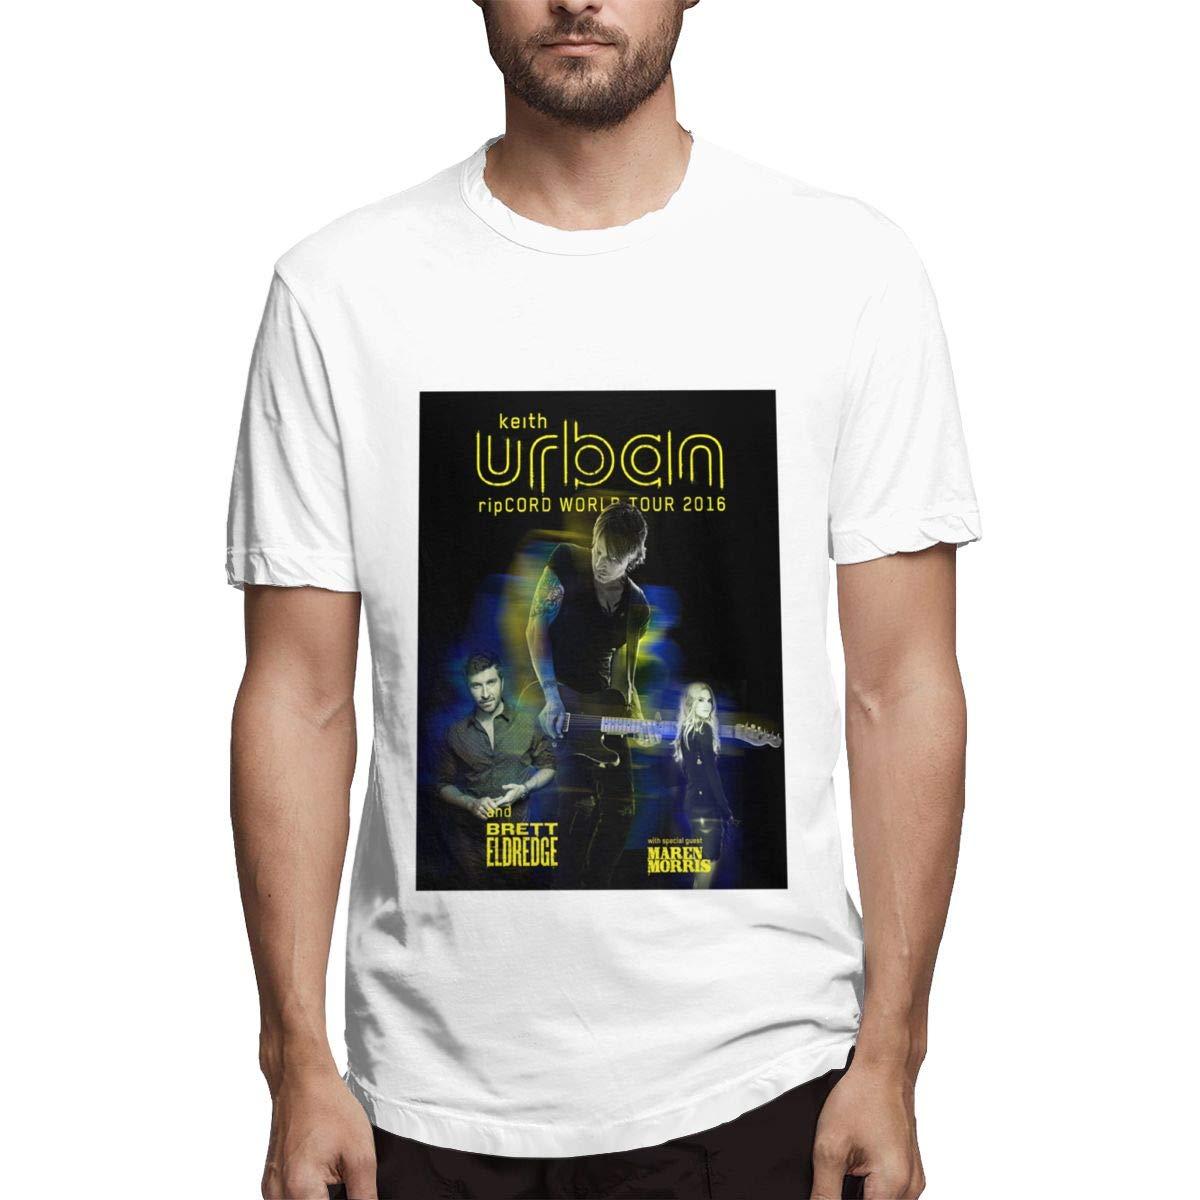 100 Shirt With Keith Urban Ripcord Long Design